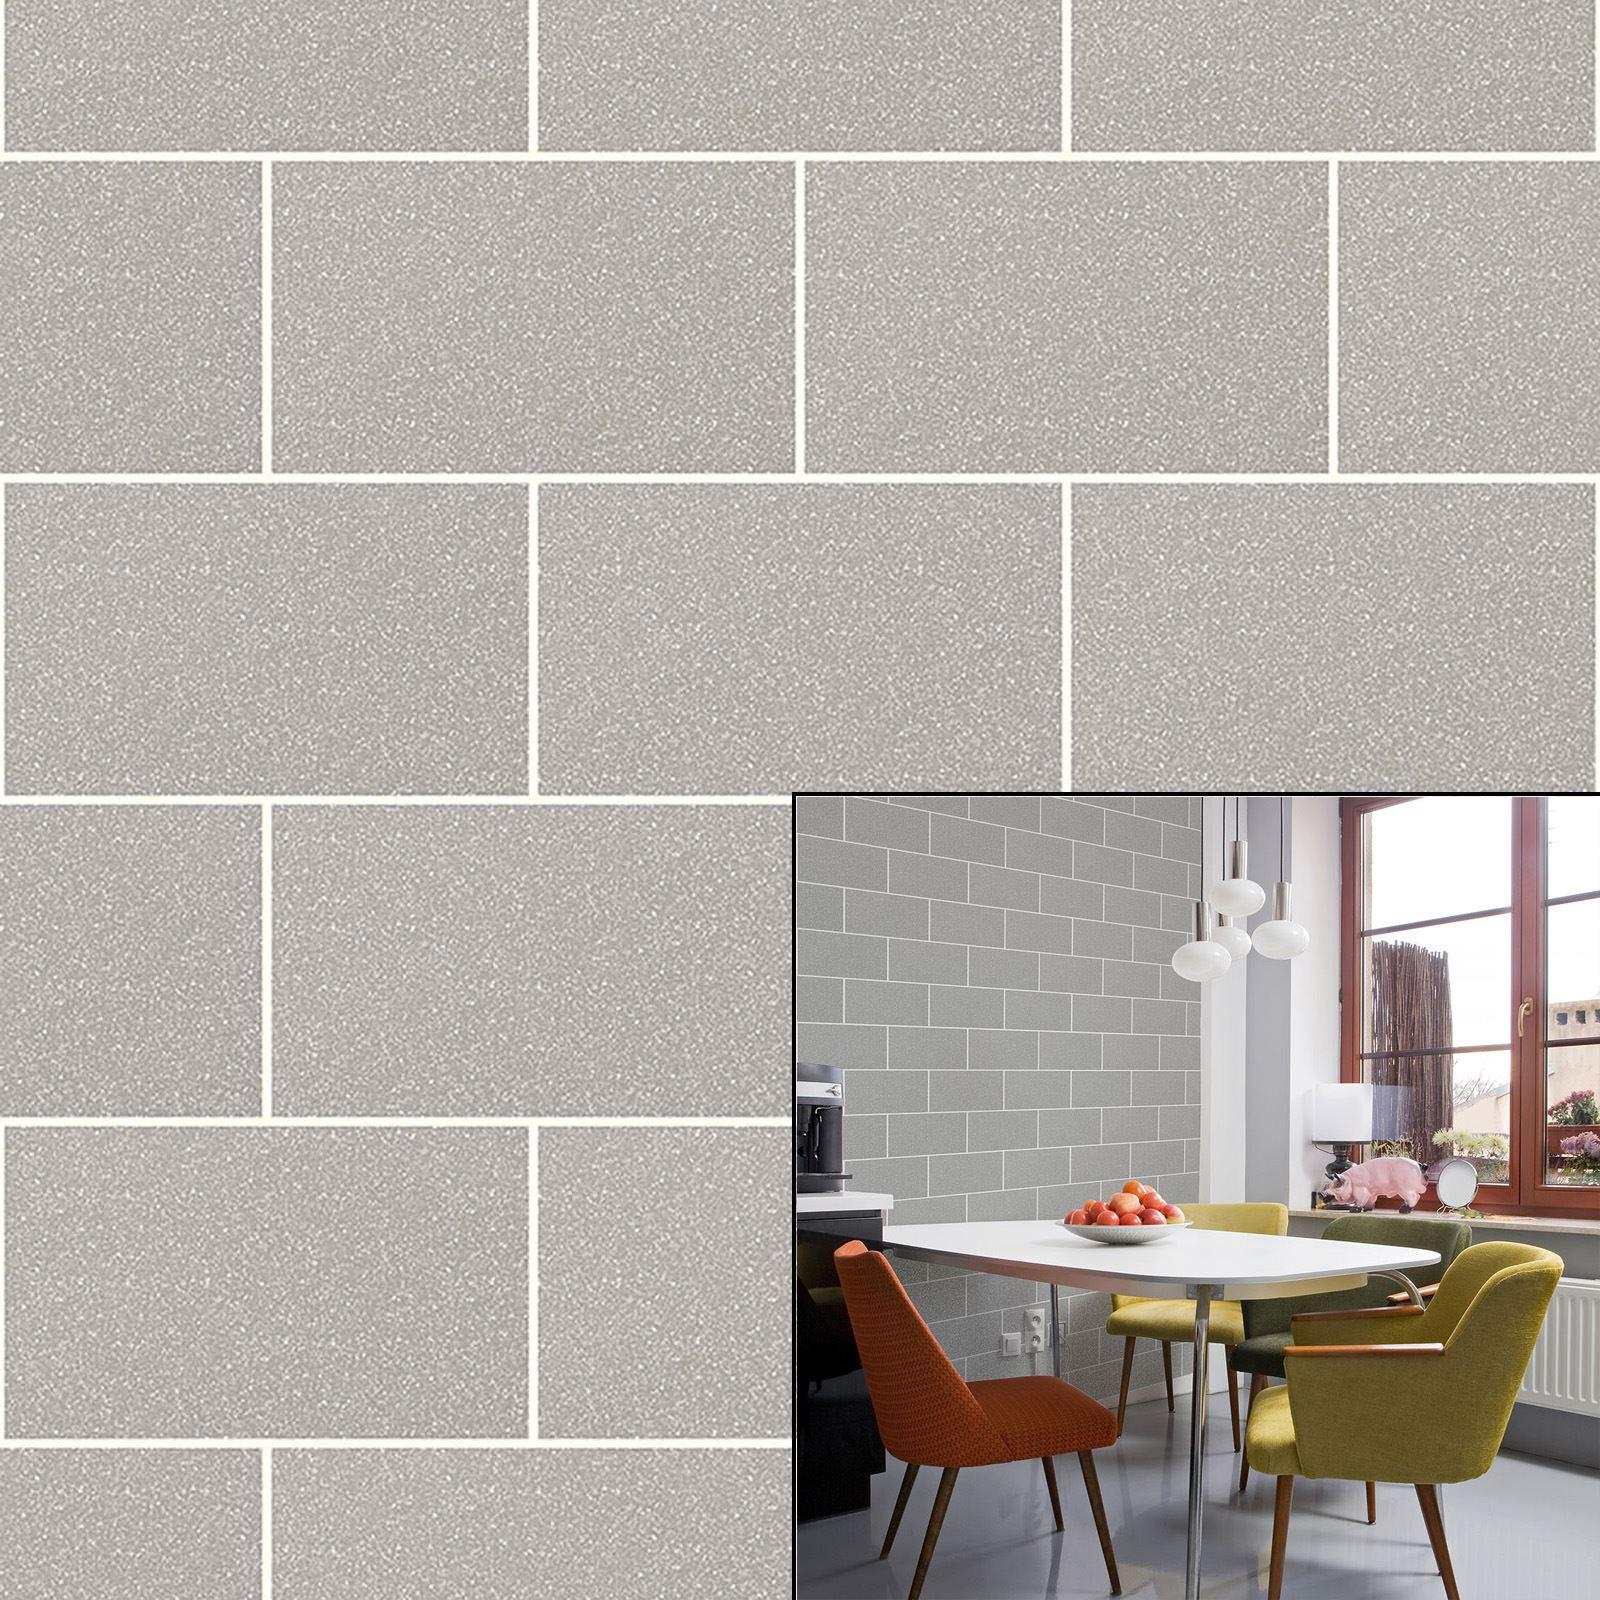 Crown london tile grey mist urban brick effect glitter for Tile effect kitchen wallpaper